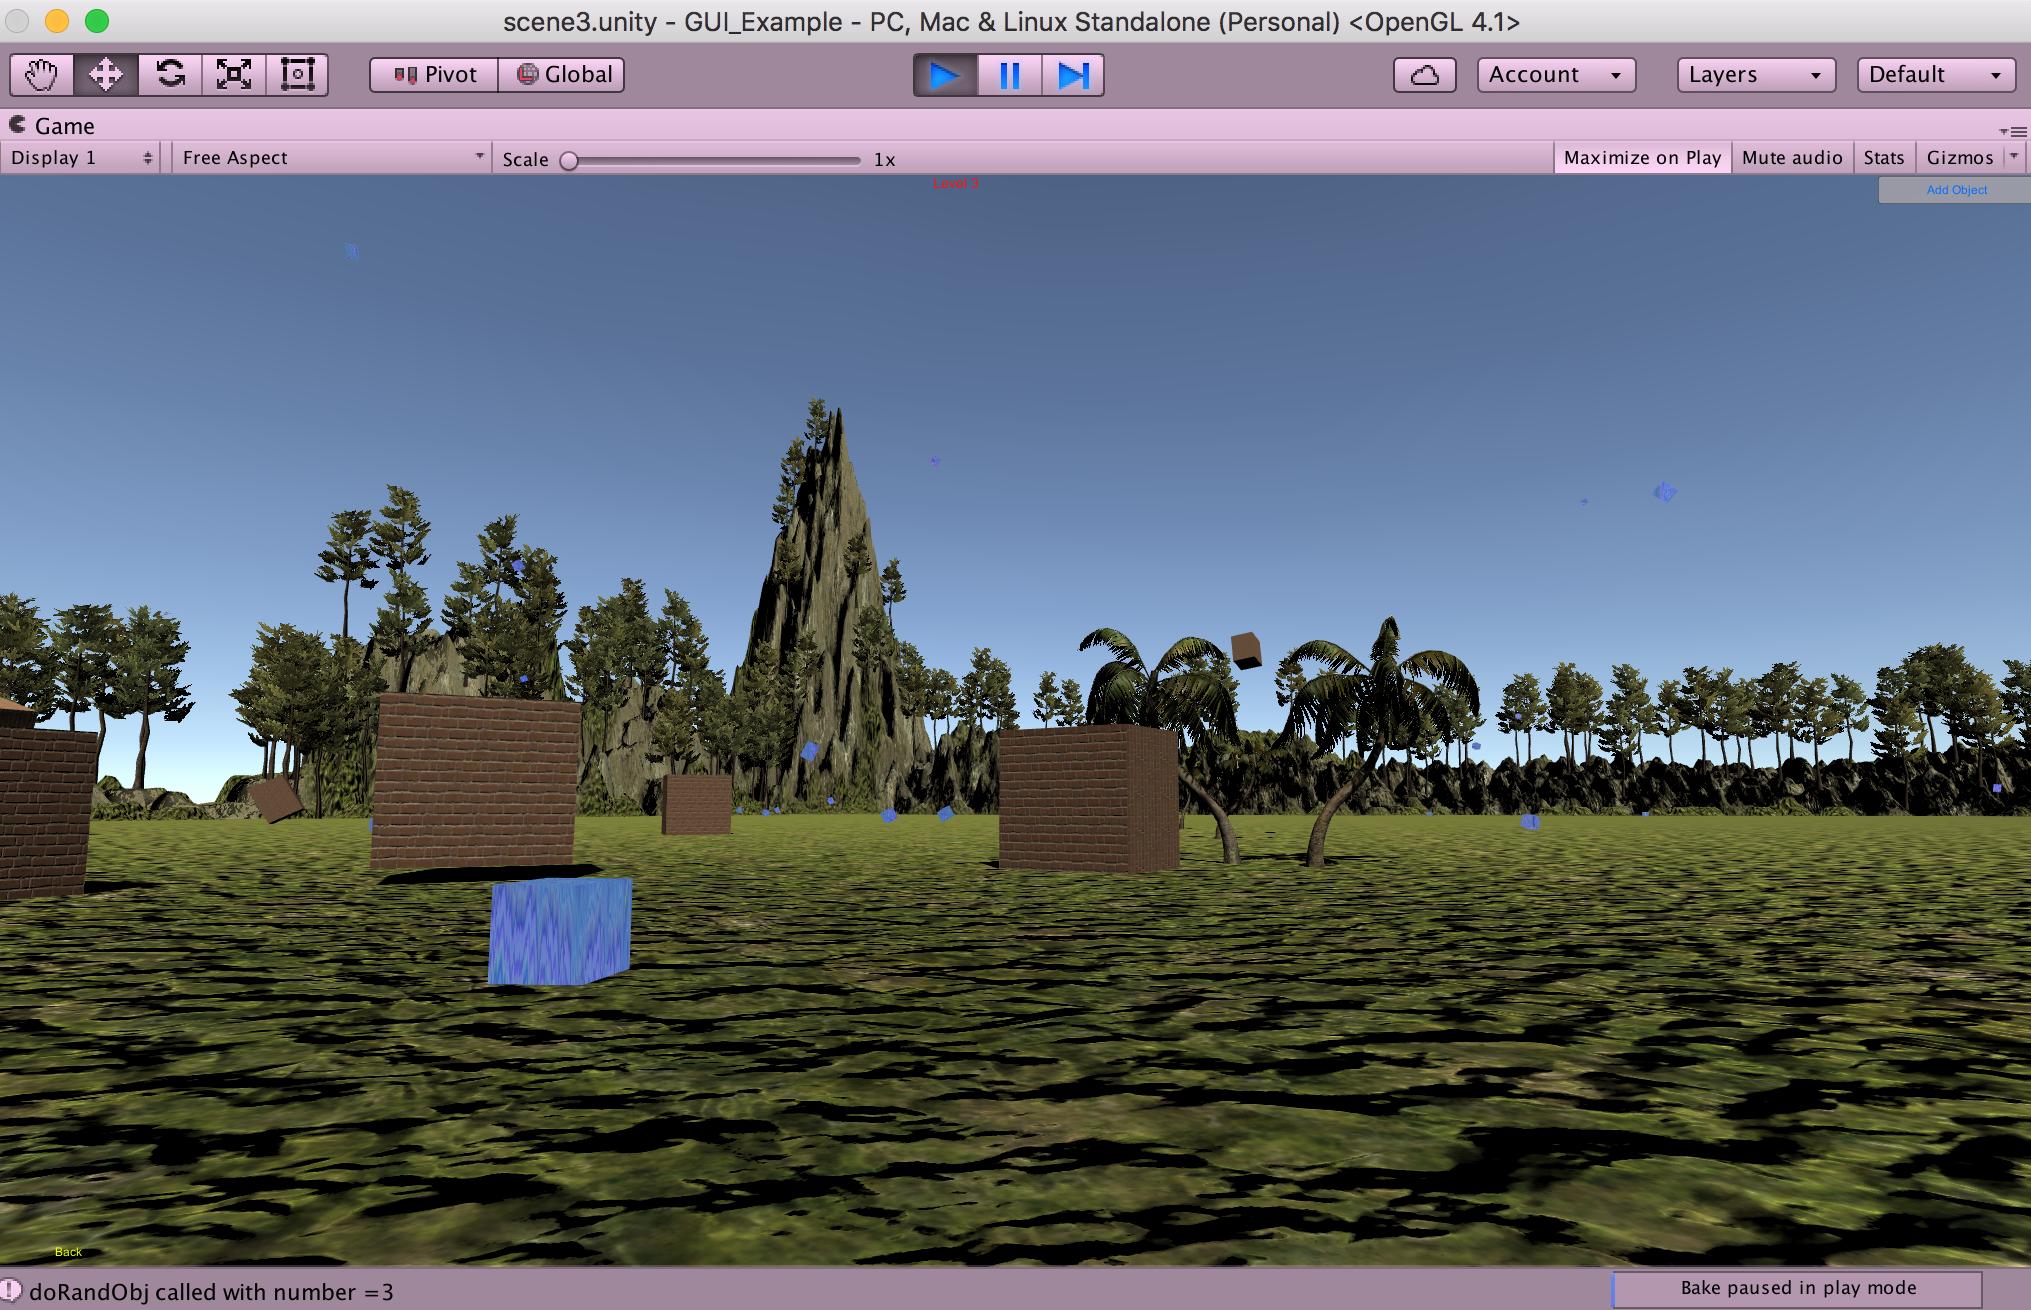 GUI scene loader demo